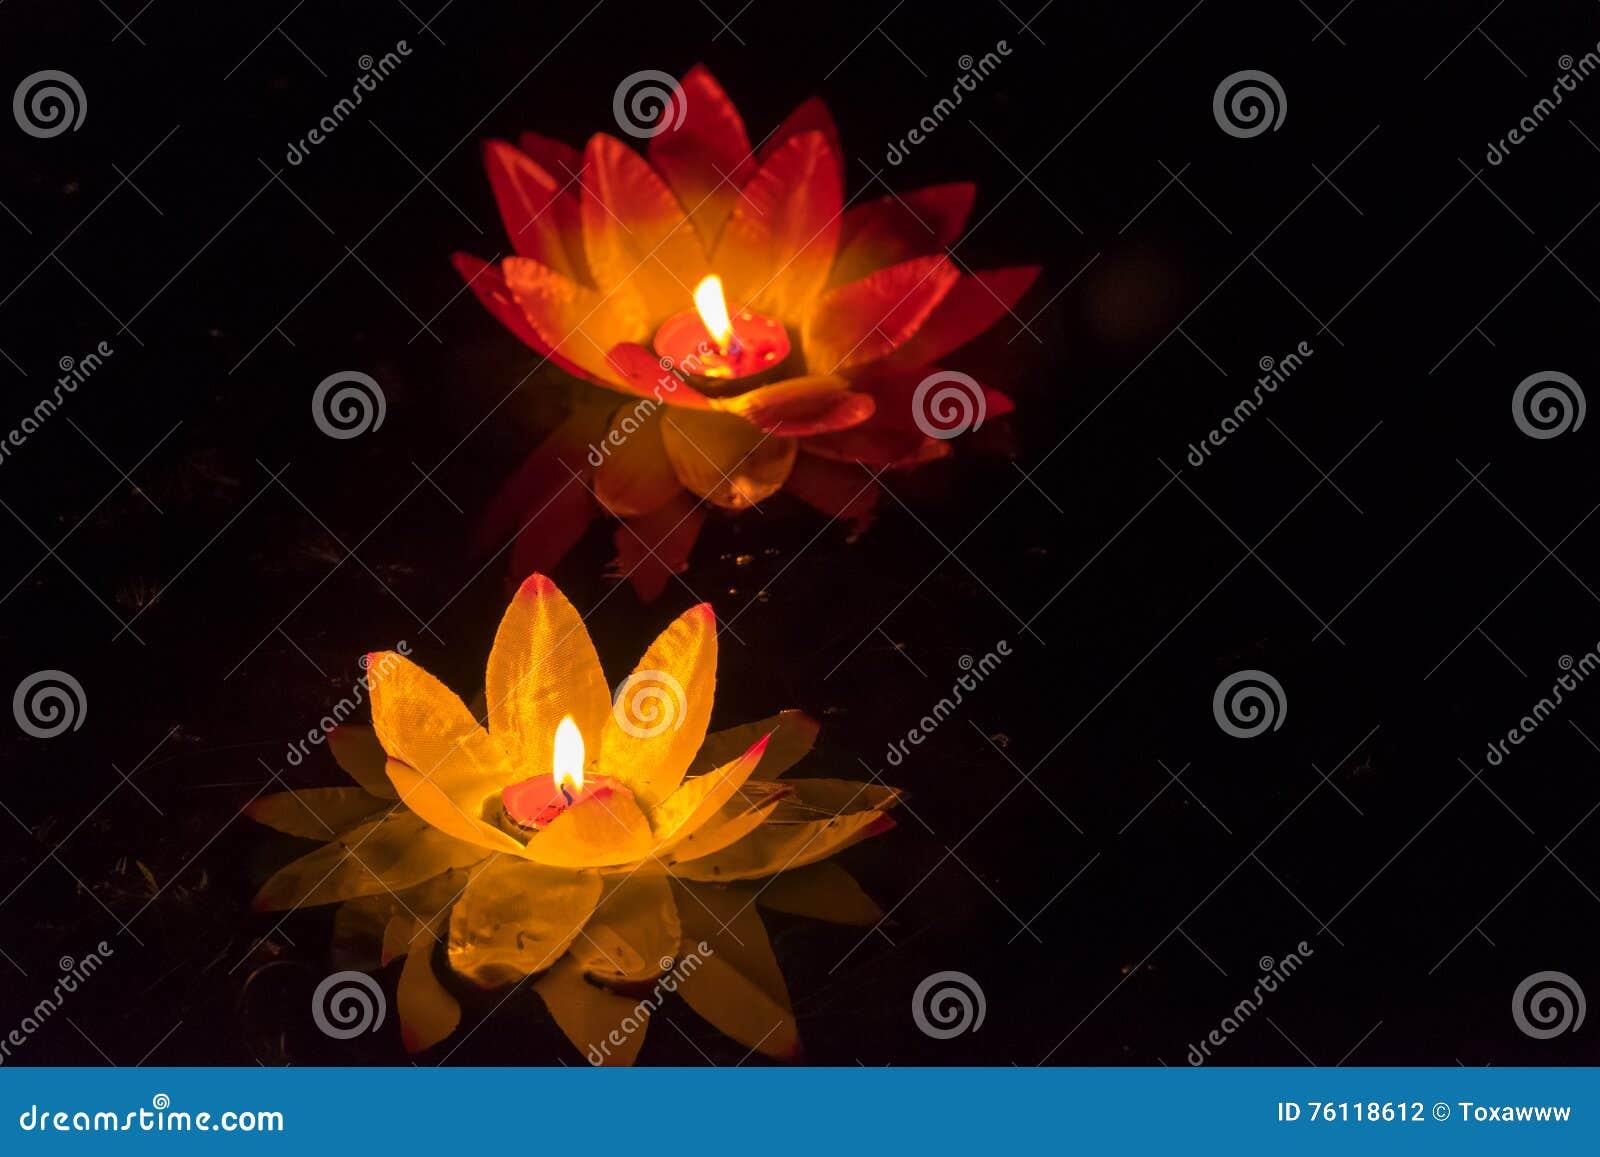 Floating Lotus Flower Paper Lanterns On Water Stock Photo Image Of